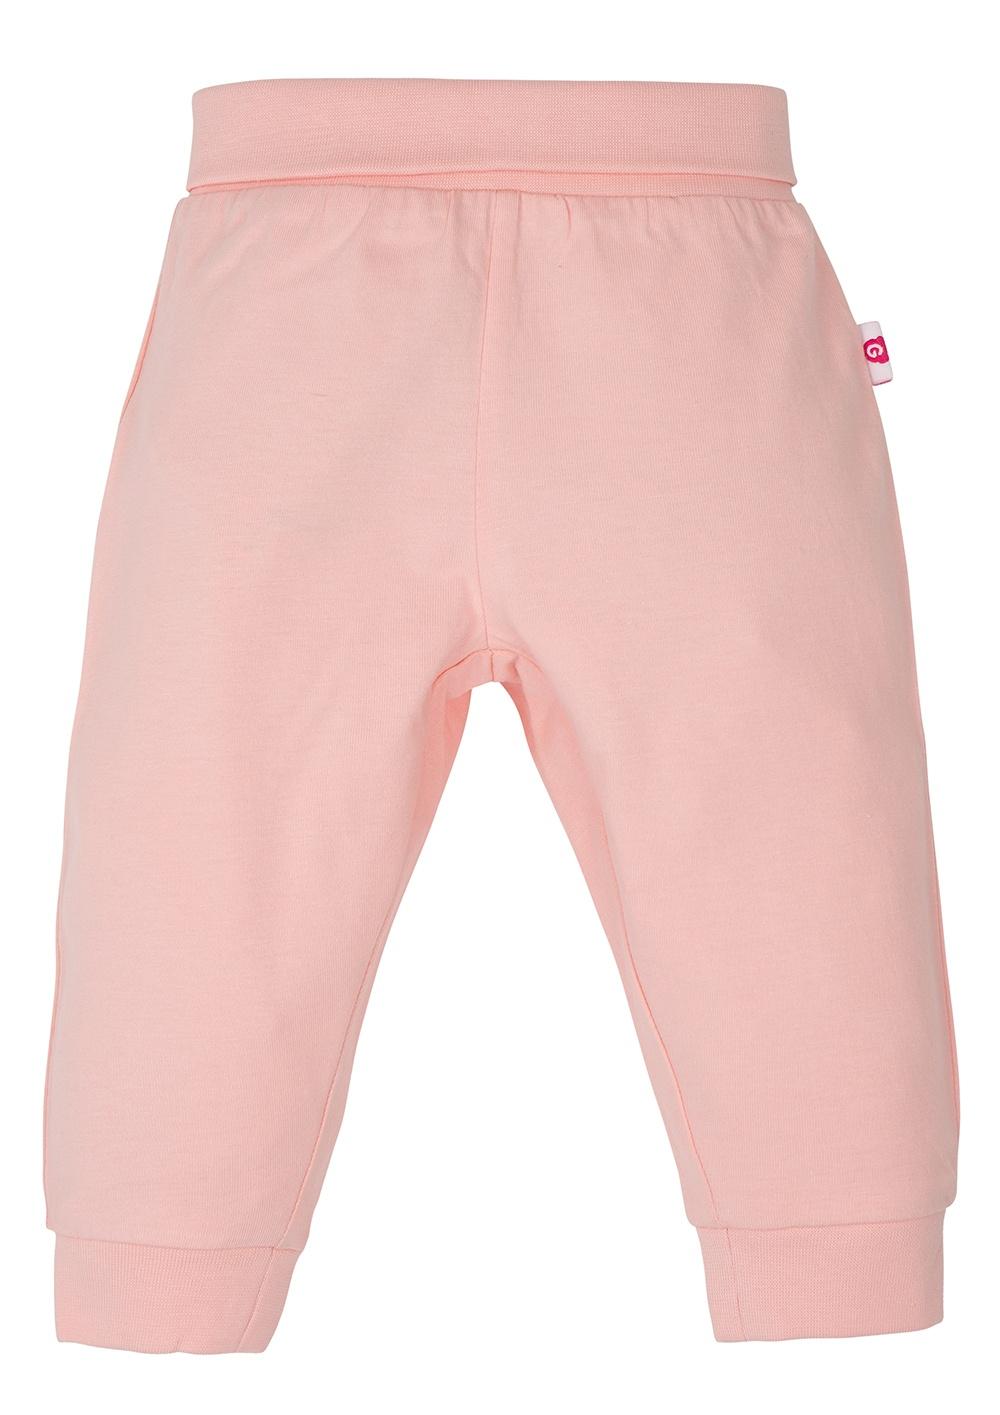 Gmini BASIC-kalhoty bez ťapek B růžová 074